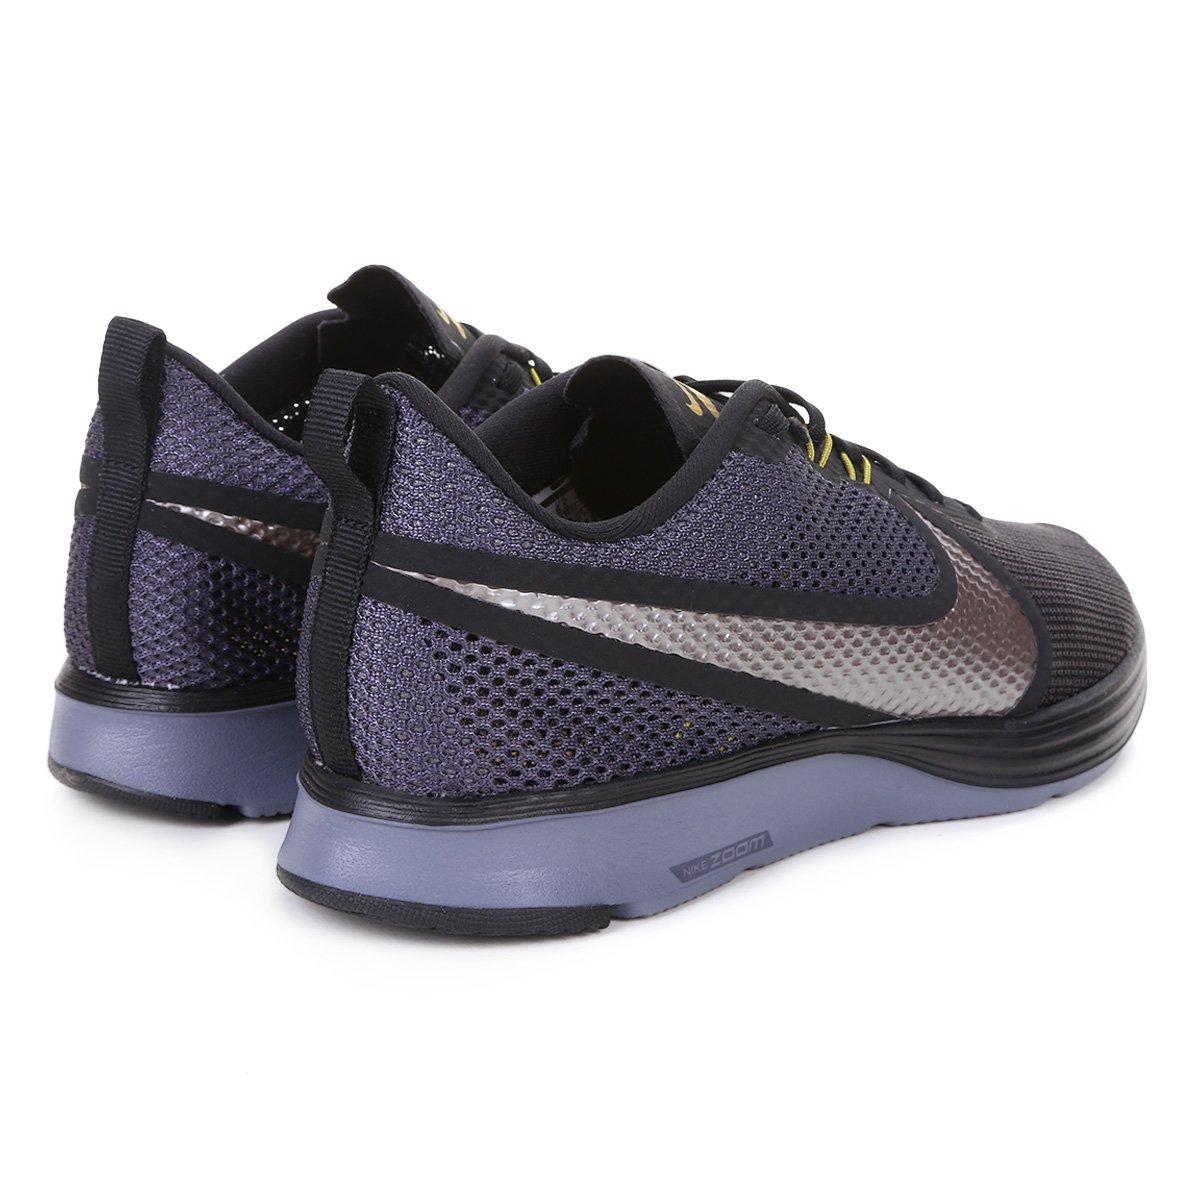 2da000146b7 ... Foto 3 - Tênis Nike Zoom Strike 2 Masculino ...